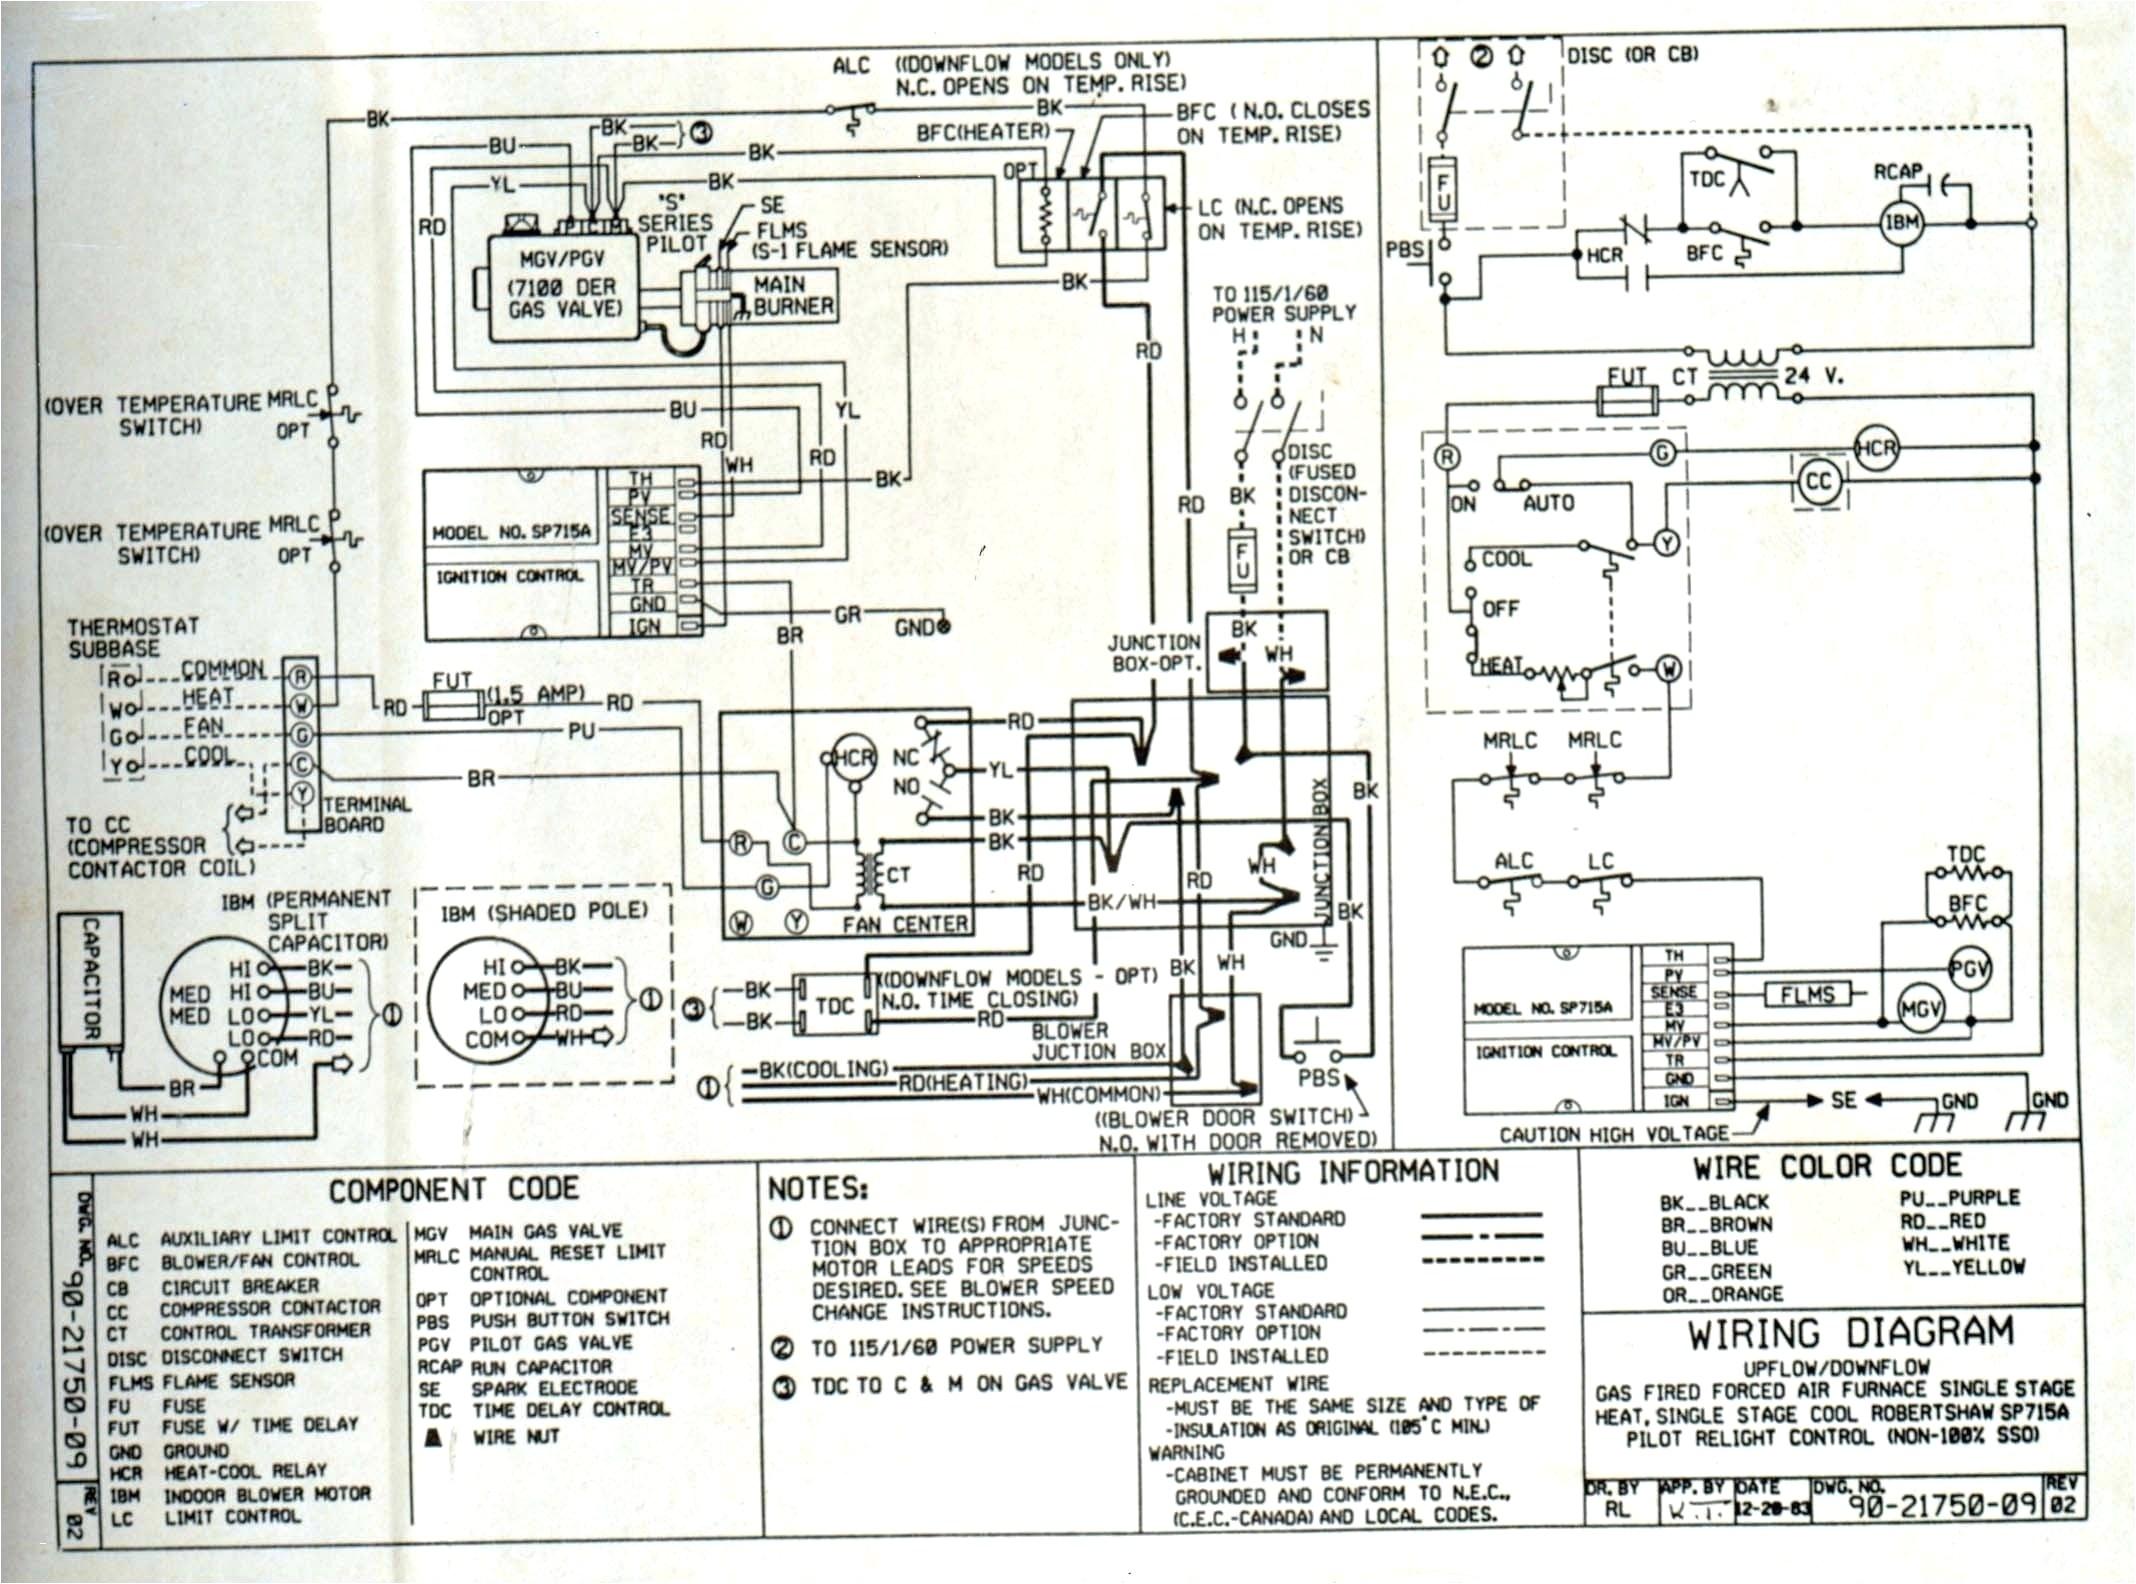 wiring coleman diagram furnace tg8s100b12mp11 wiring diagram var wiring coleman diagram furnace tg8s100b12mp11